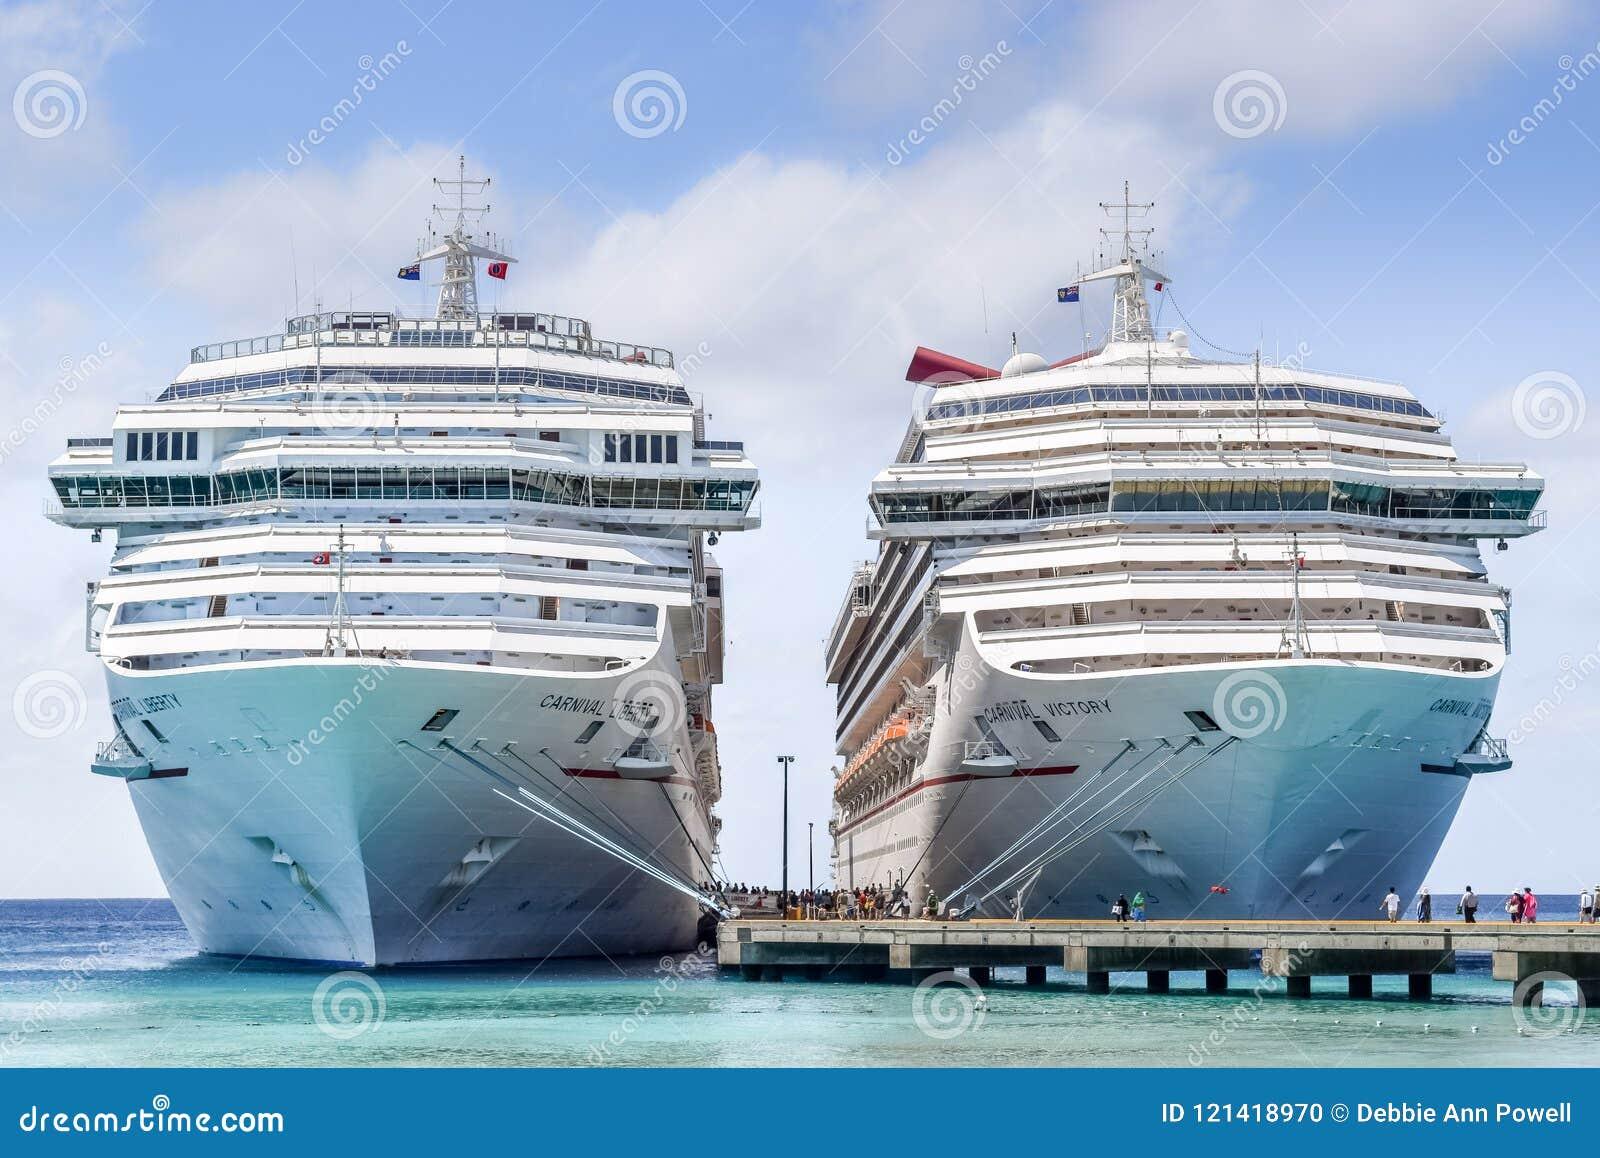 Grand Turk, Turks And Caicos Islands - April 03 2014 ...